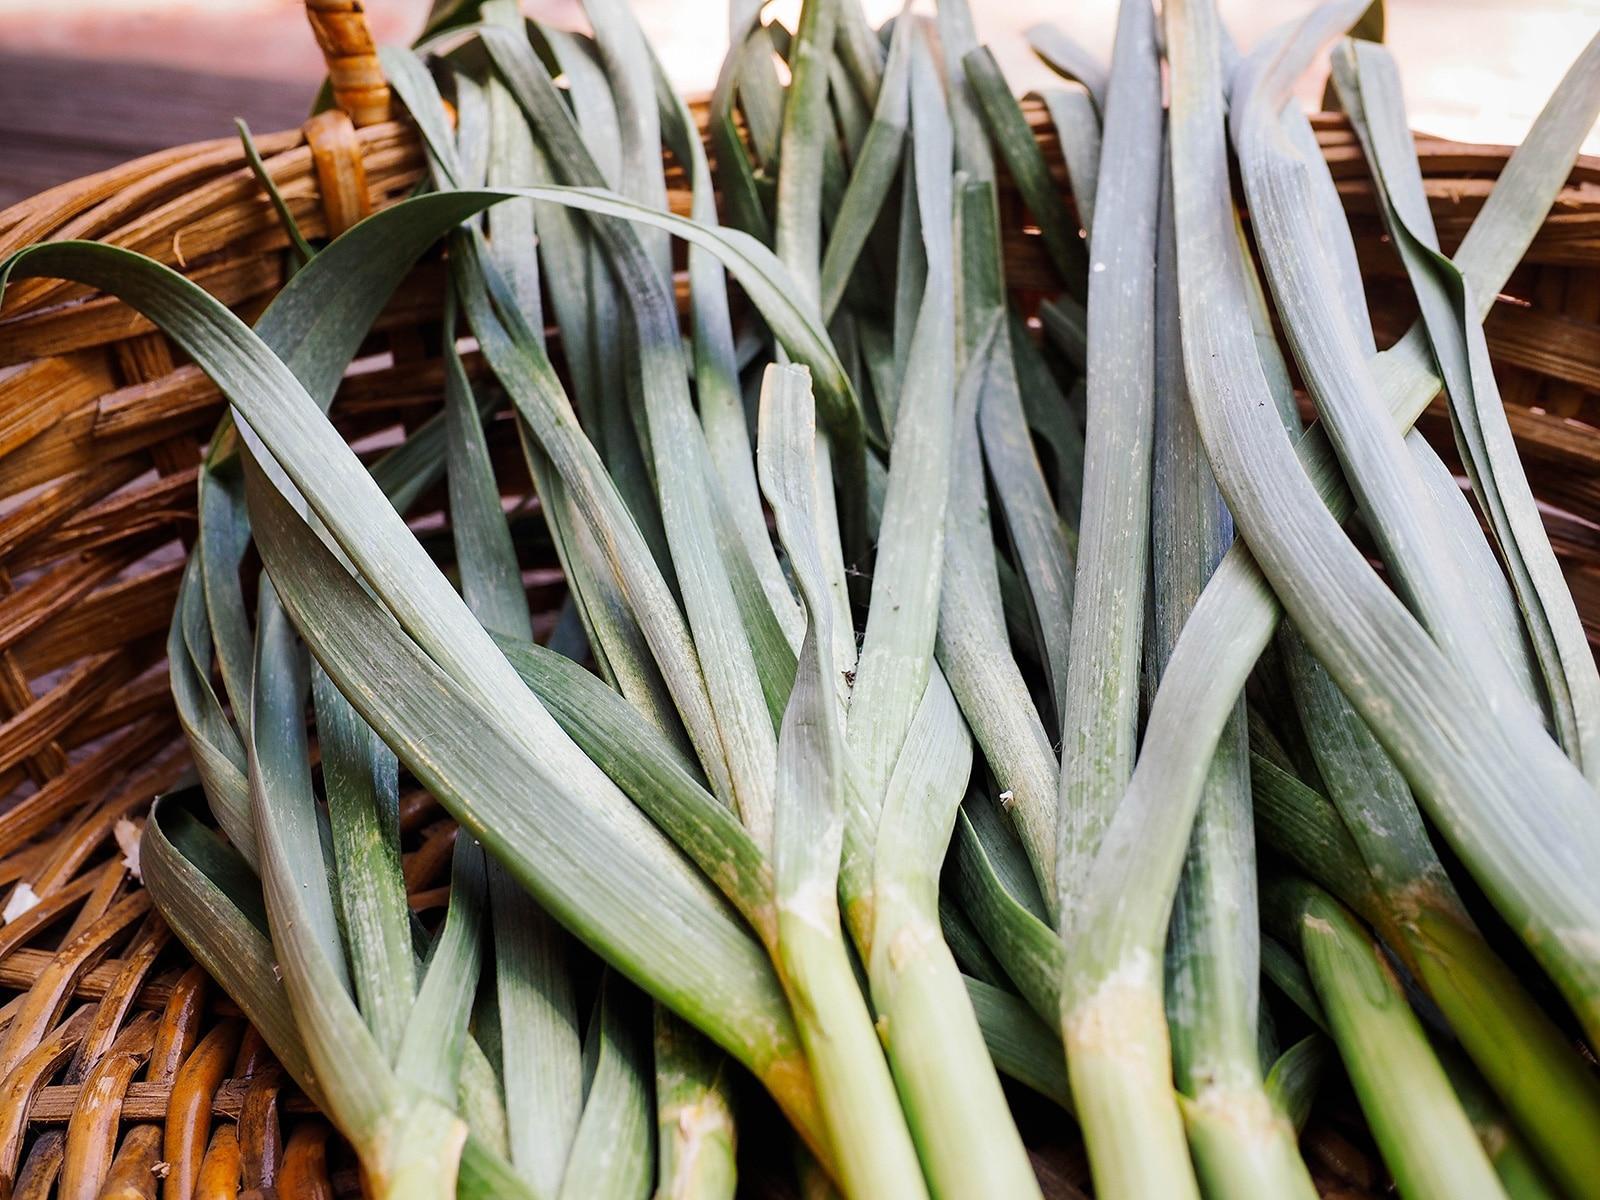 Bundle of green garlic tops in a basket